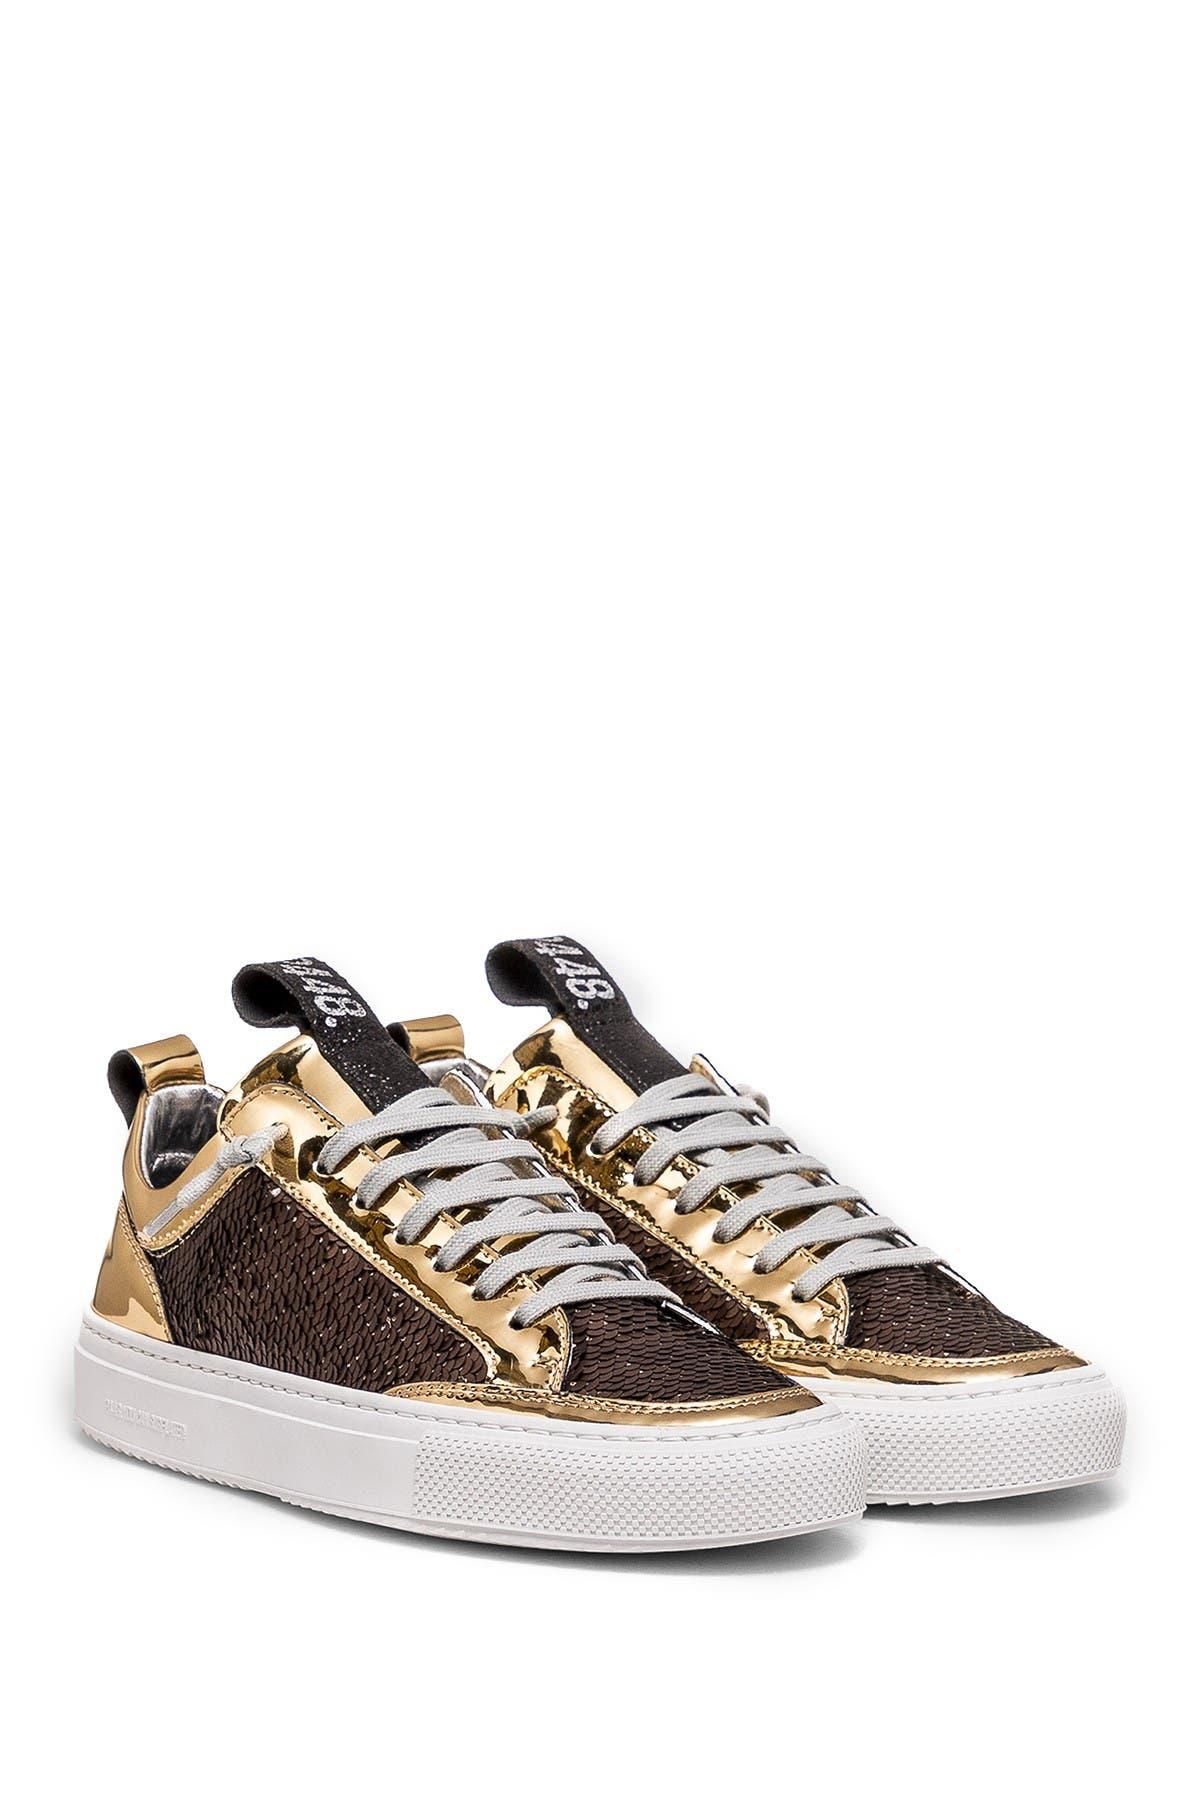 P448 | Soho Sequin Leather Sneaker